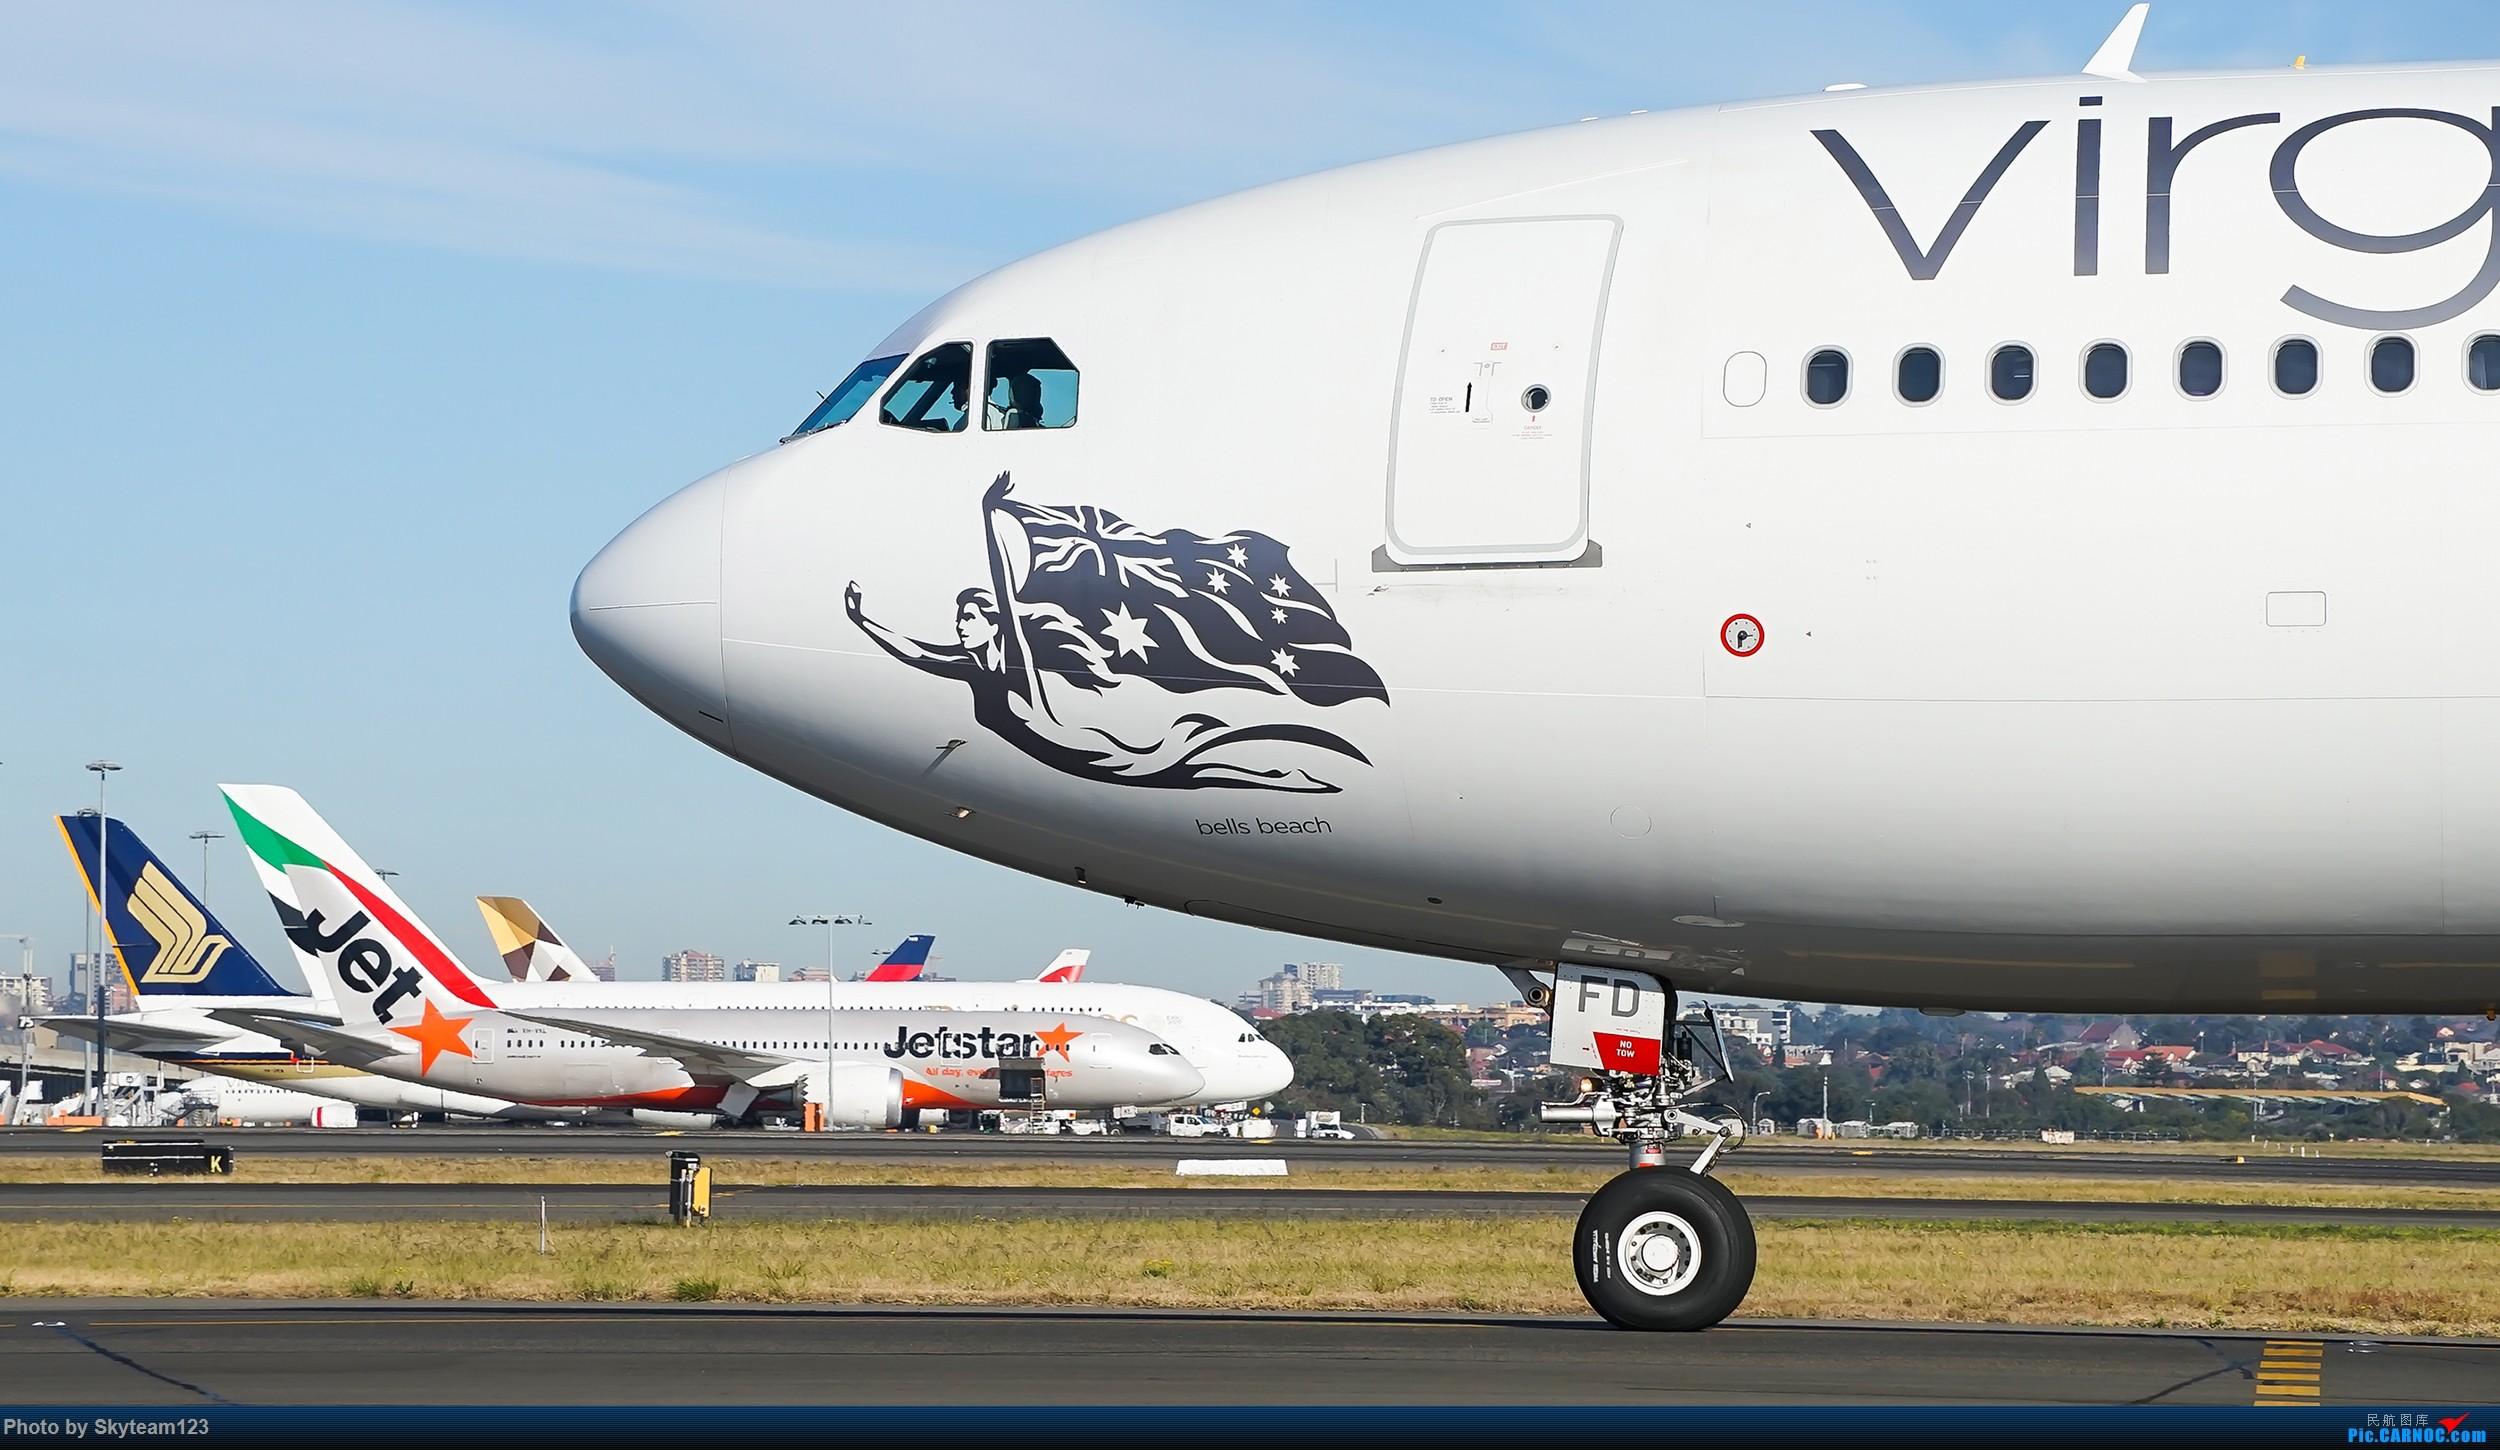 Re:[原创][SYD] 再访Blu EMU停车场 早上34L抵港出发杂图几张 AIRBUS A330-200 VH-XFD 澳大利亚悉尼金斯福德·史密斯机场